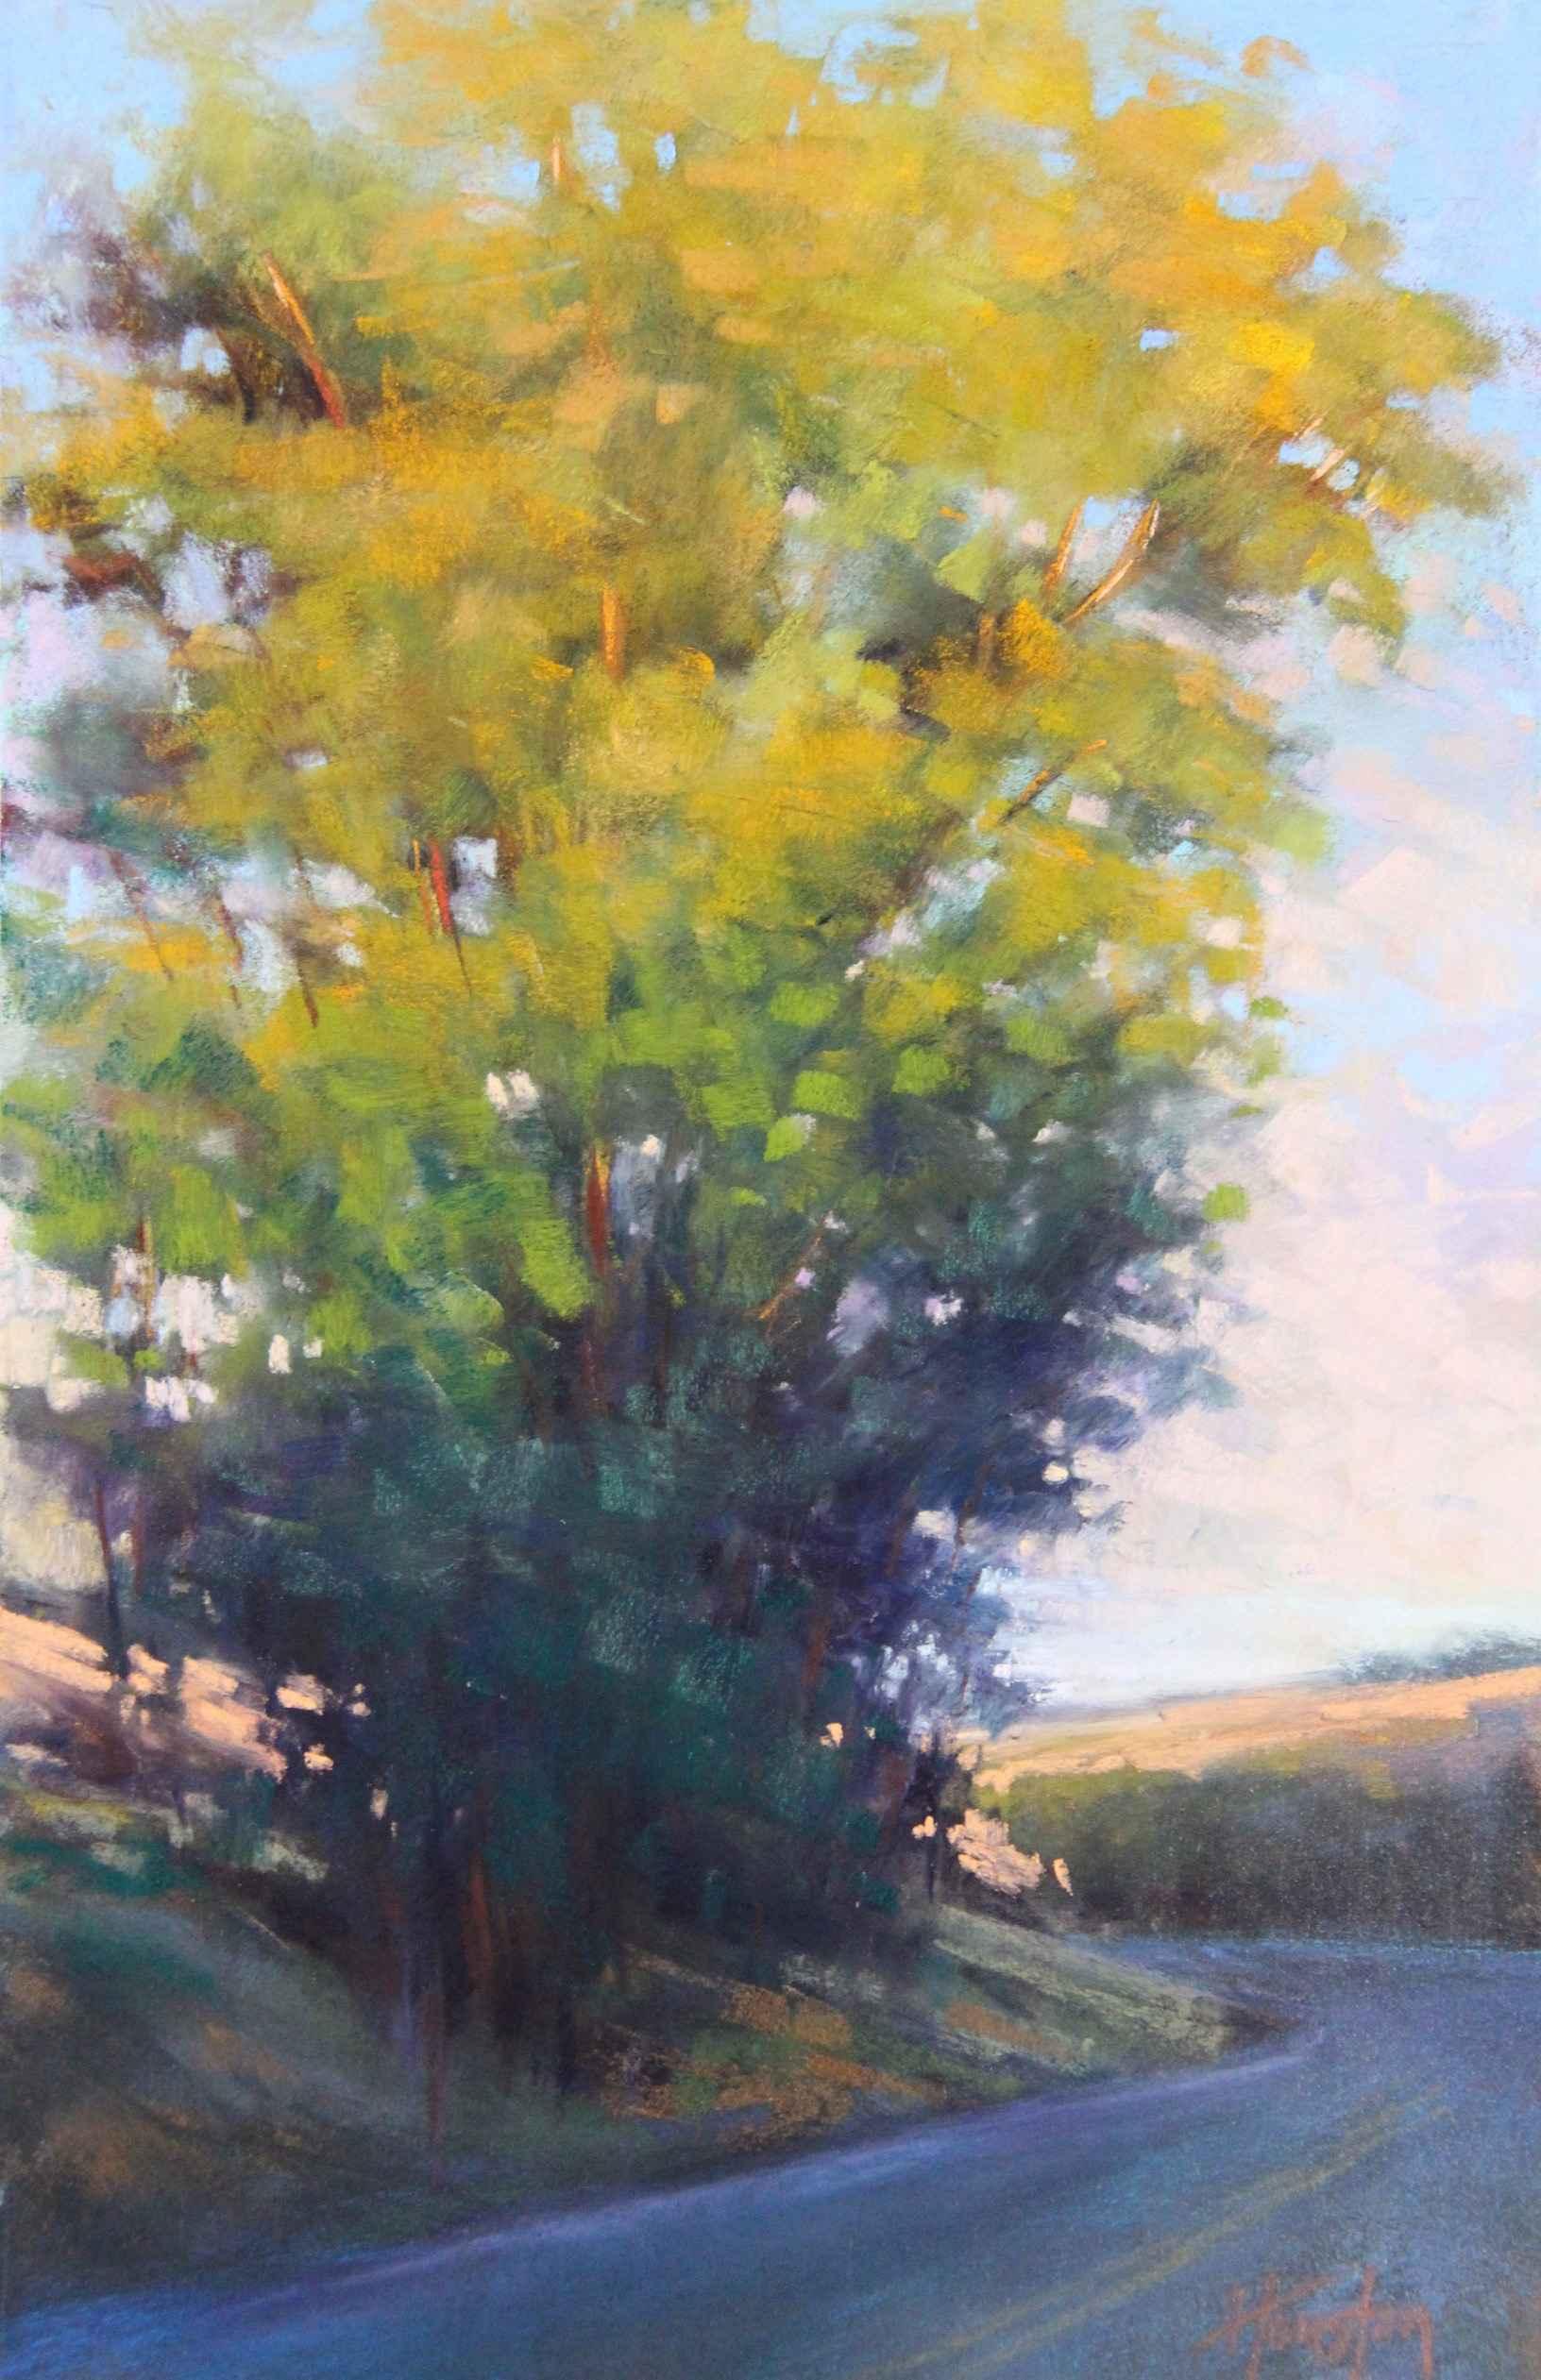 Chasing the Light by  Amanda Houston - Masterpiece Online